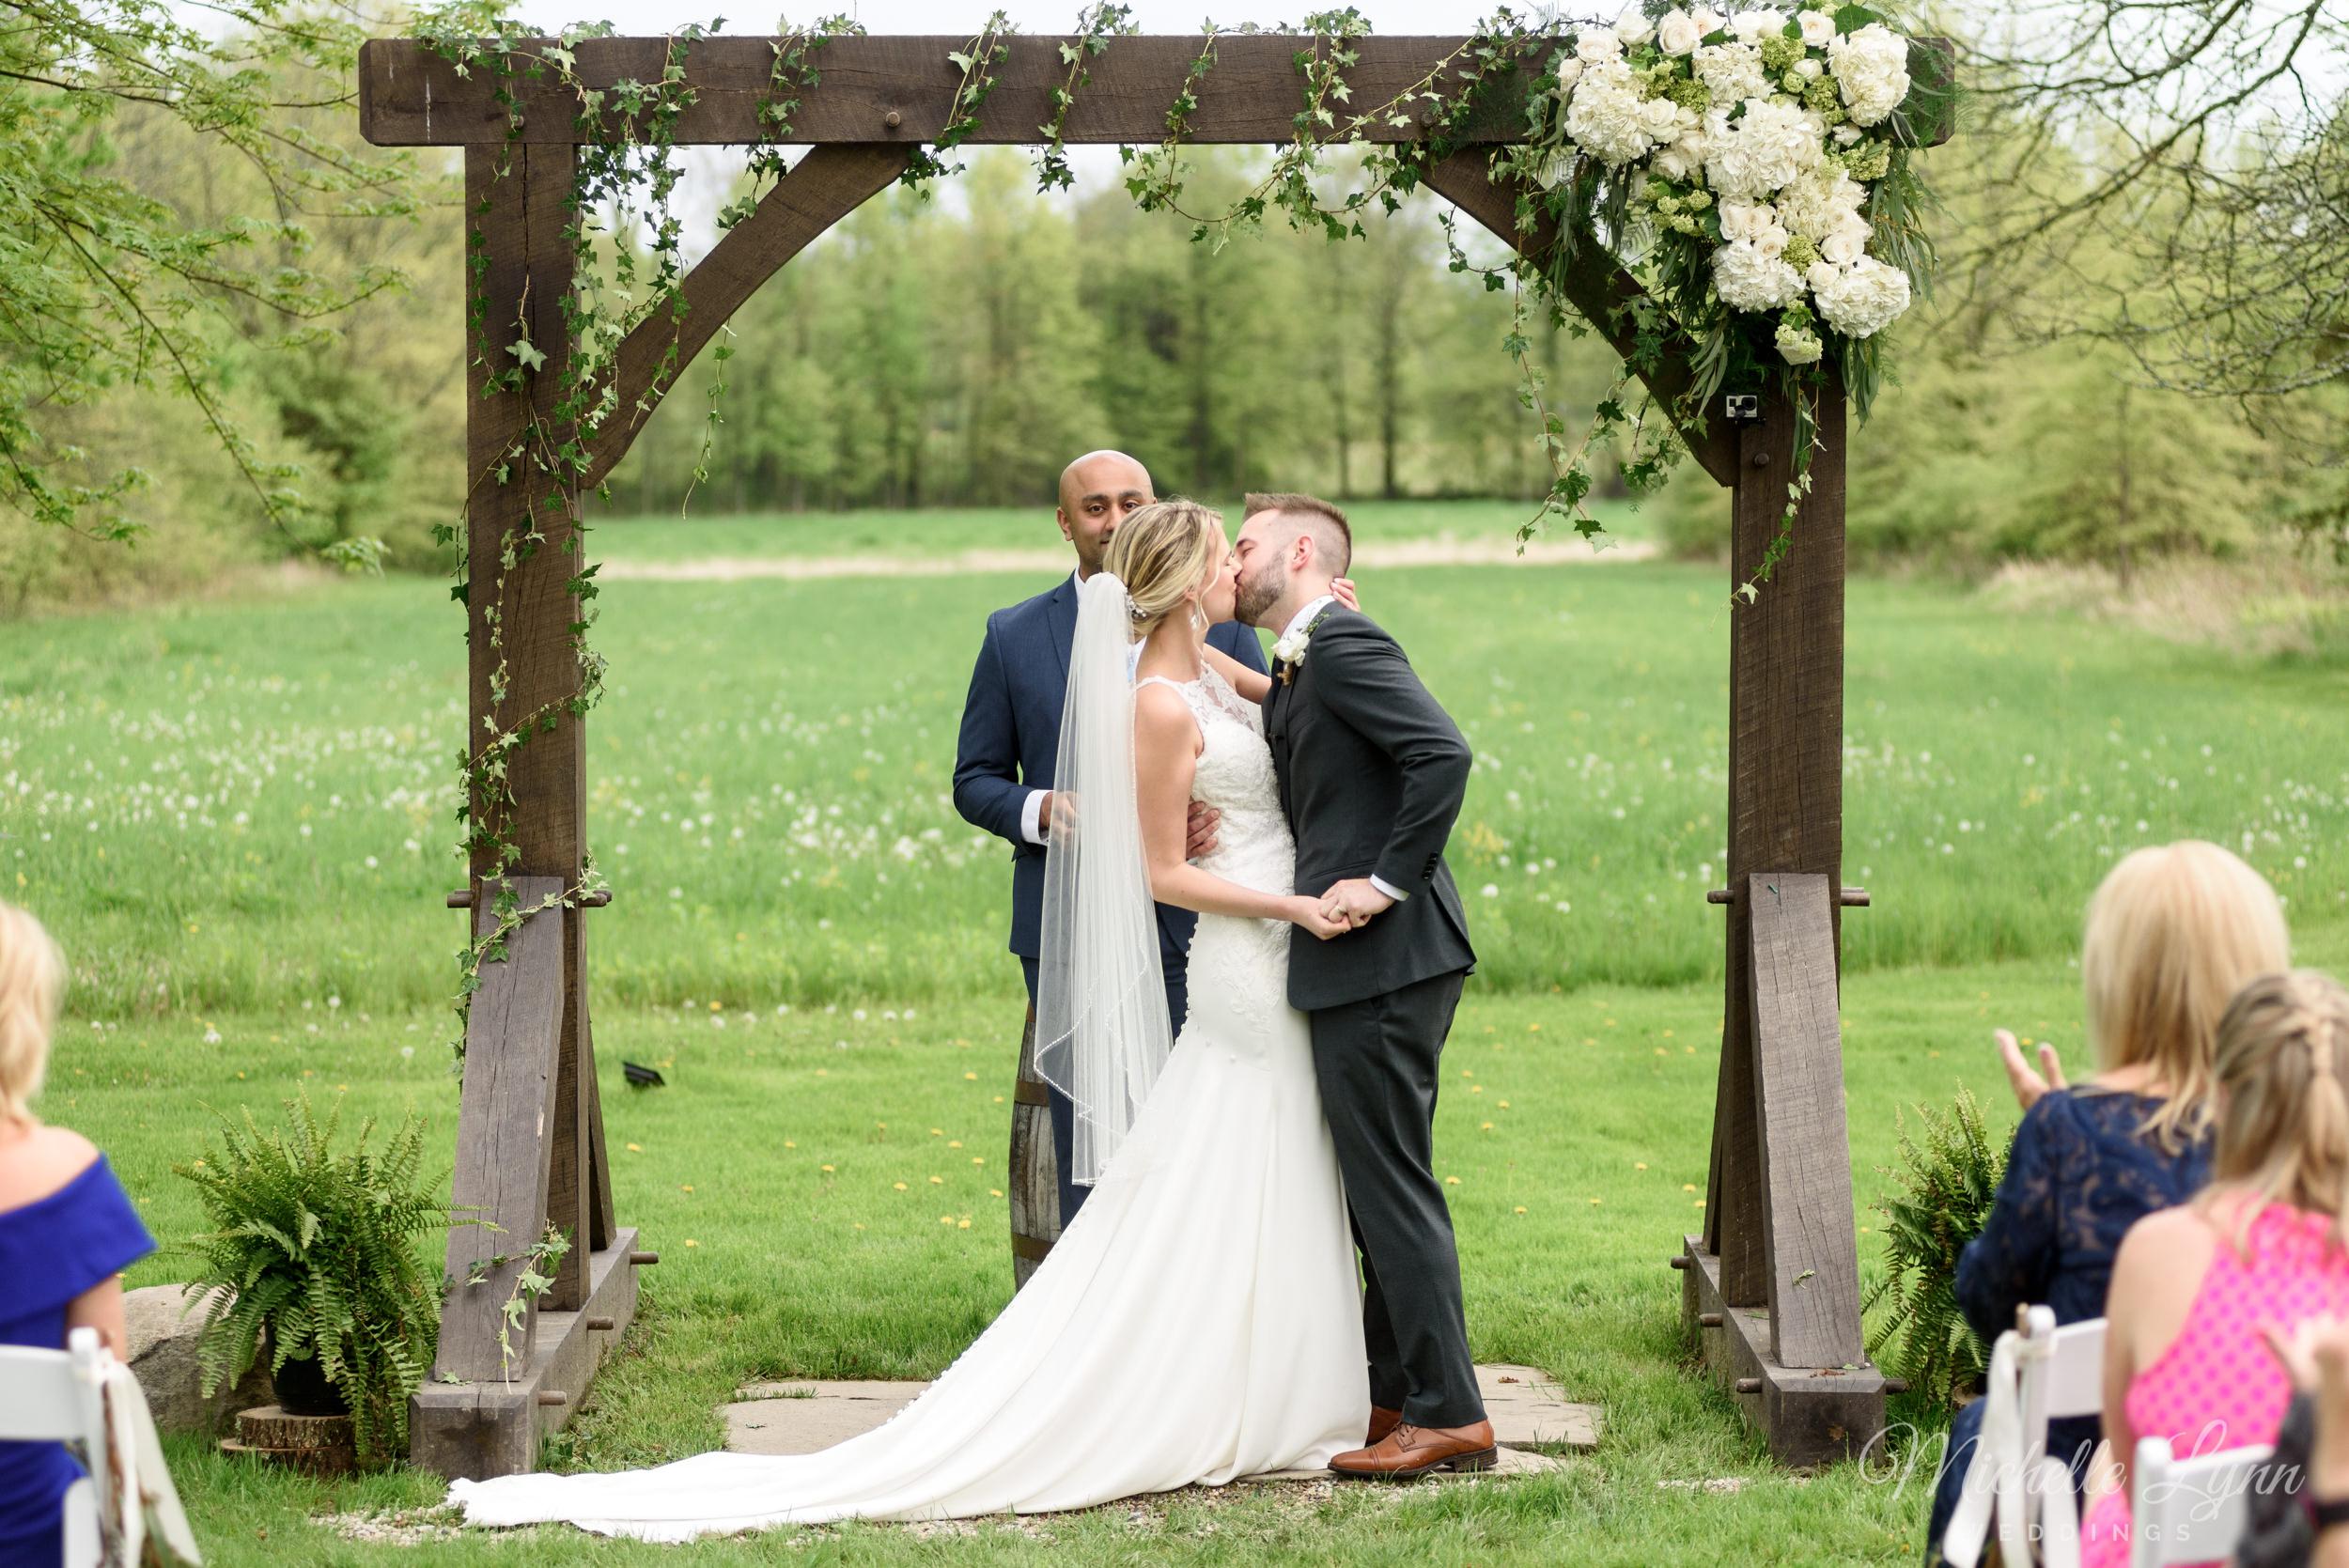 mlw-the-farm-bakery-and-events-wedding-photos-45.jpg